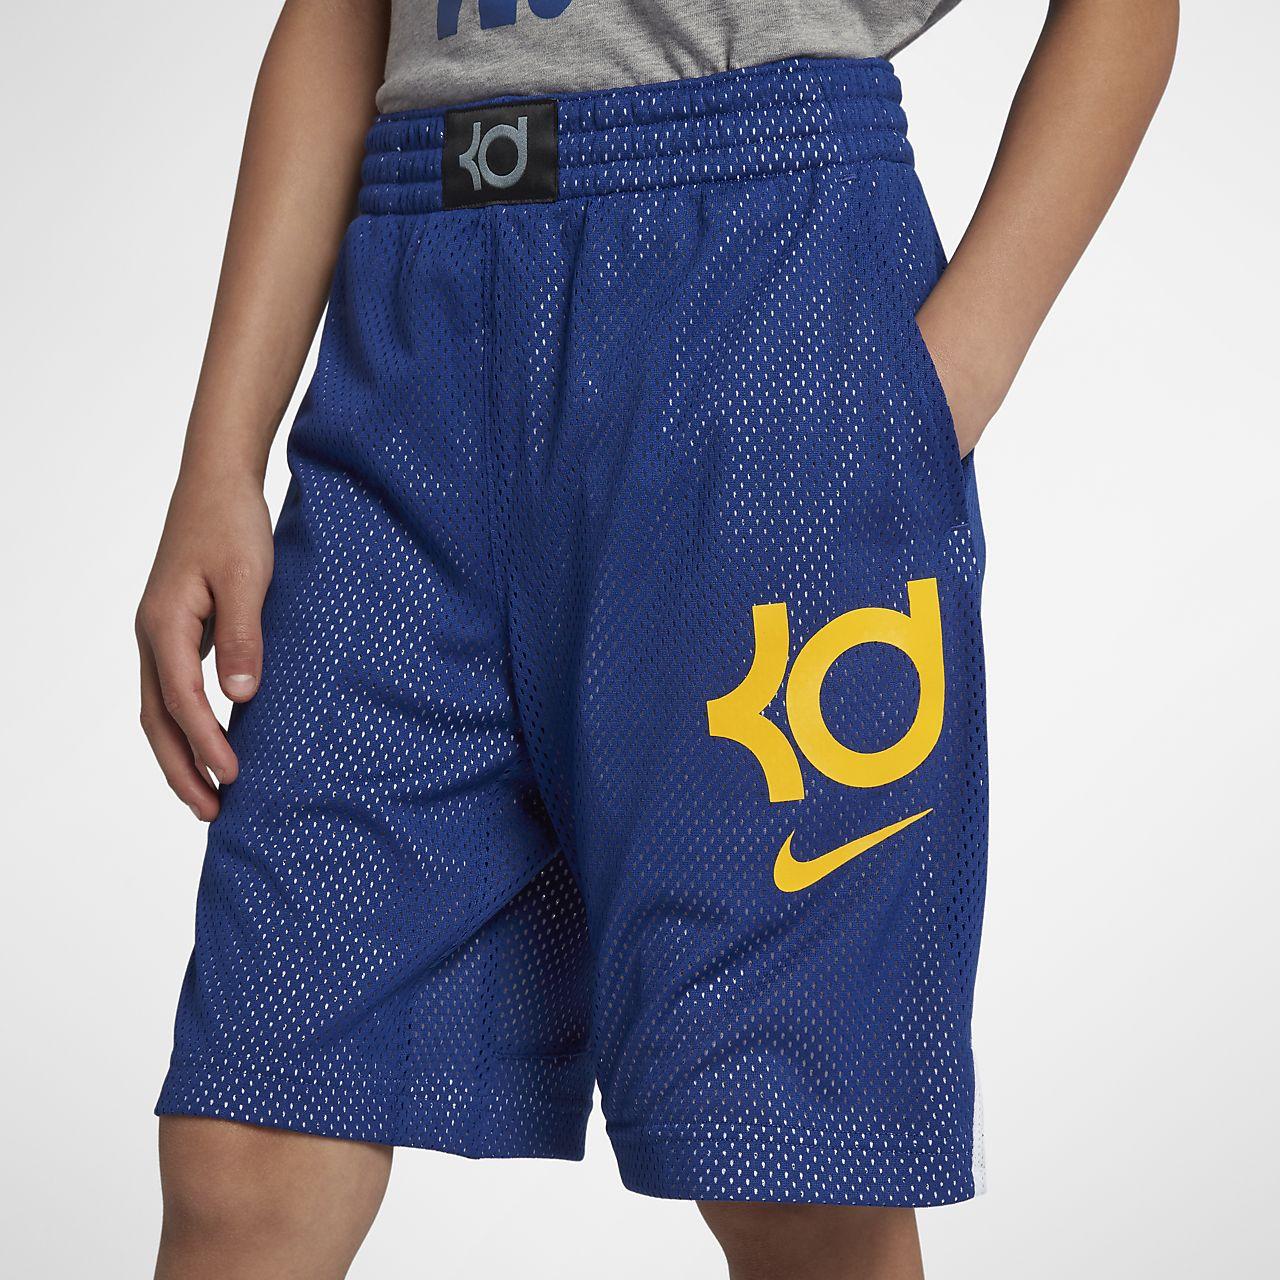 0b2134cba140 Nike KD Big Kids  (Boys ) Basketball Shorts. Nike.com